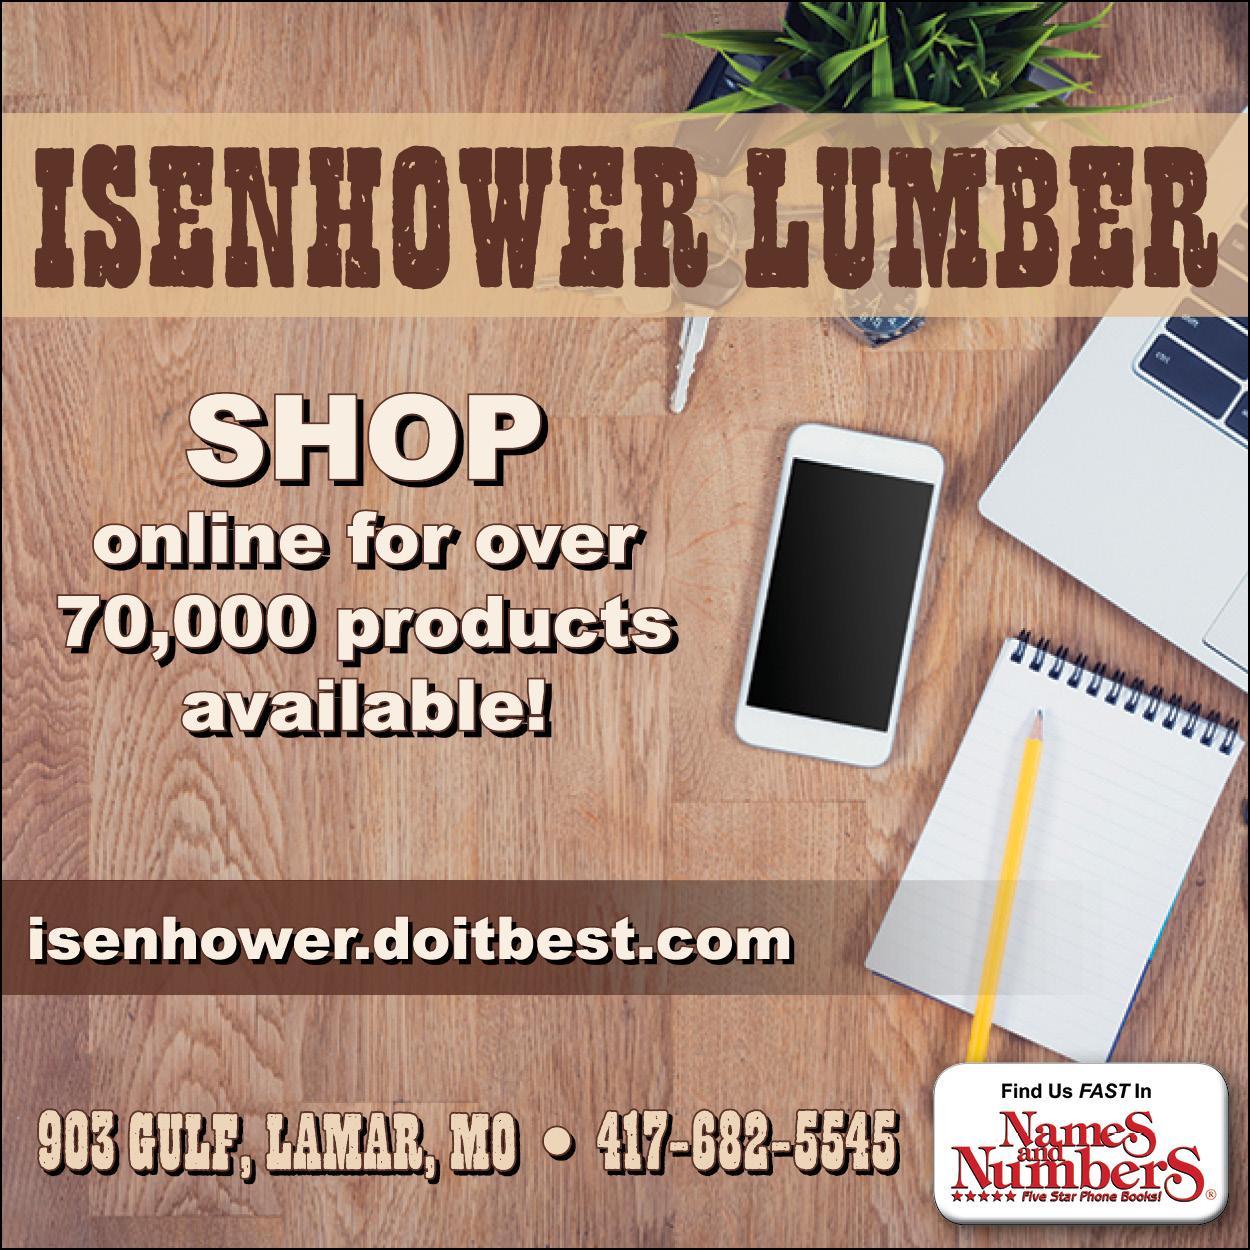 Isenhower Lumber Company